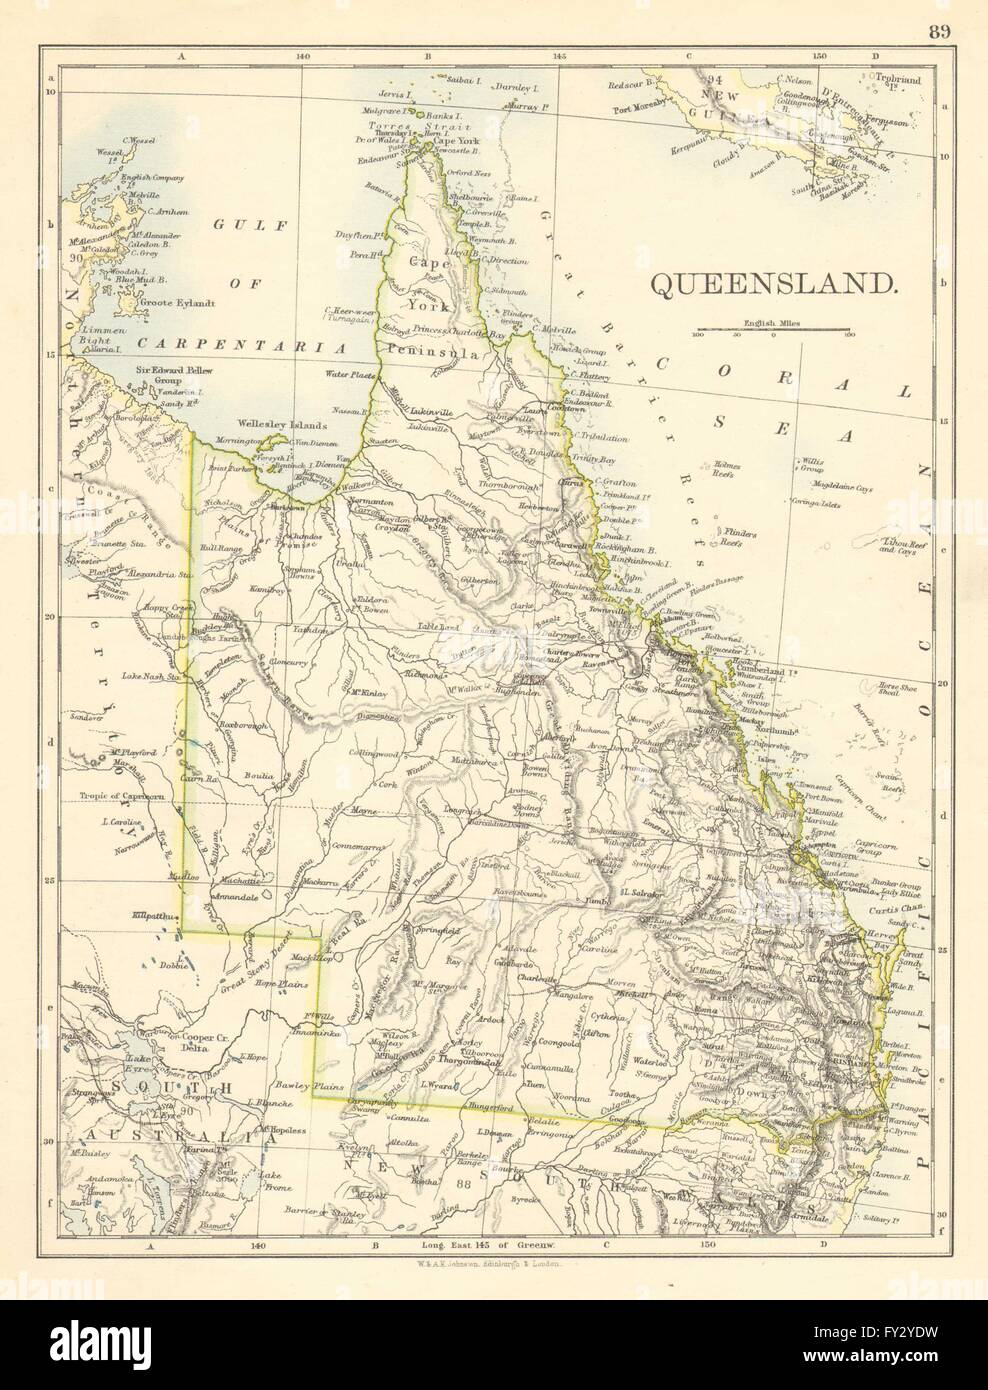 Queensland Australia Map.Queensland State Map Brisbane Gold Coast Railways Australia Stock